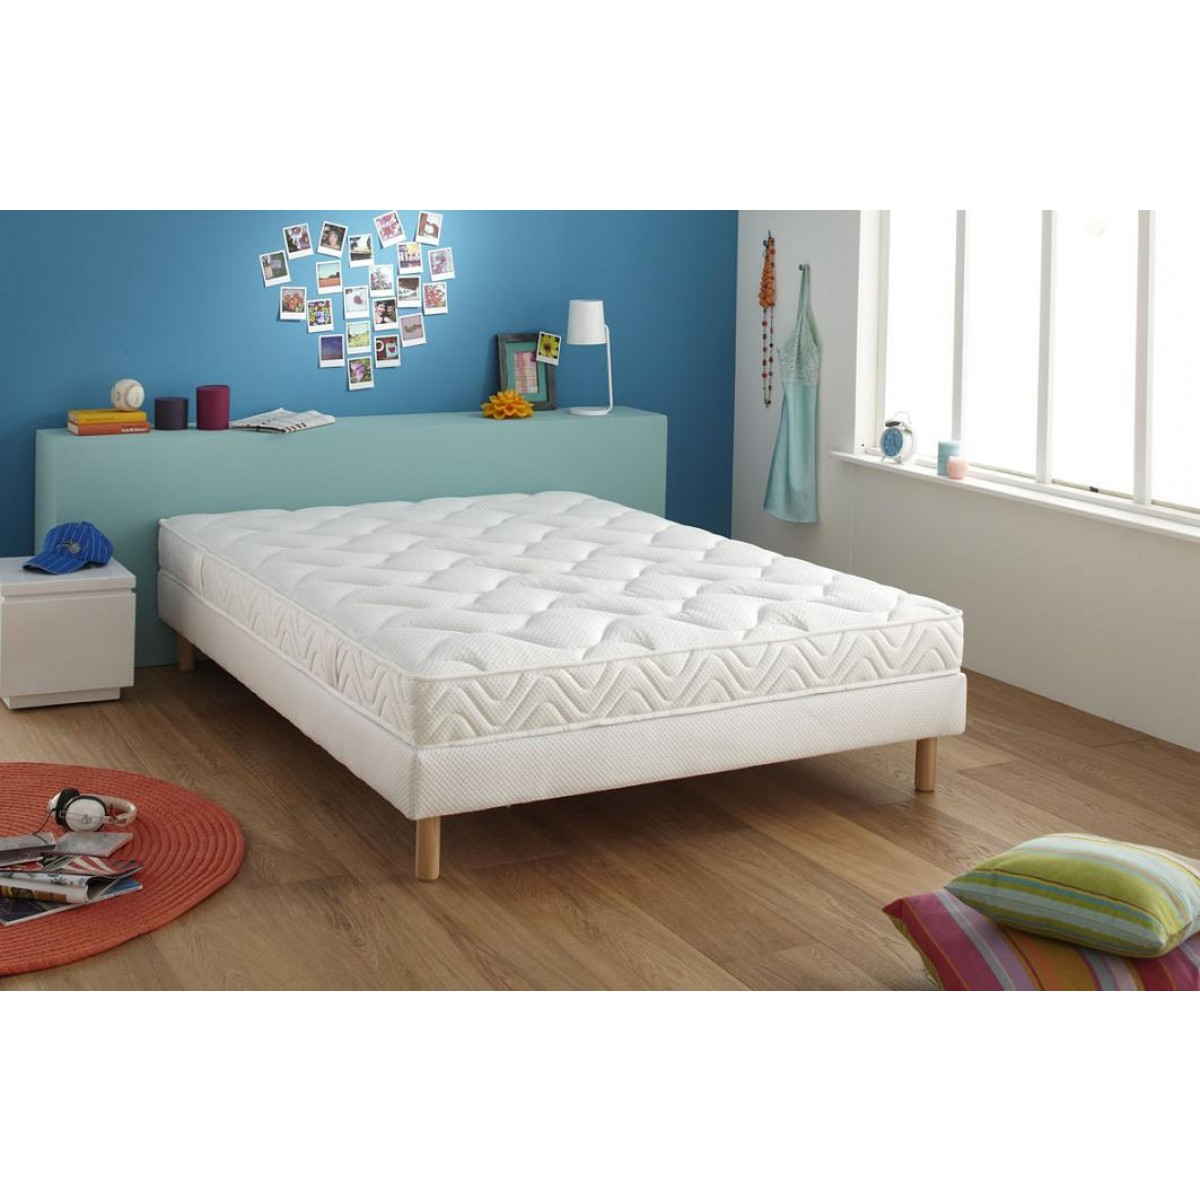 matelas latex 140x190 soldes matelas 2017. Black Bedroom Furniture Sets. Home Design Ideas